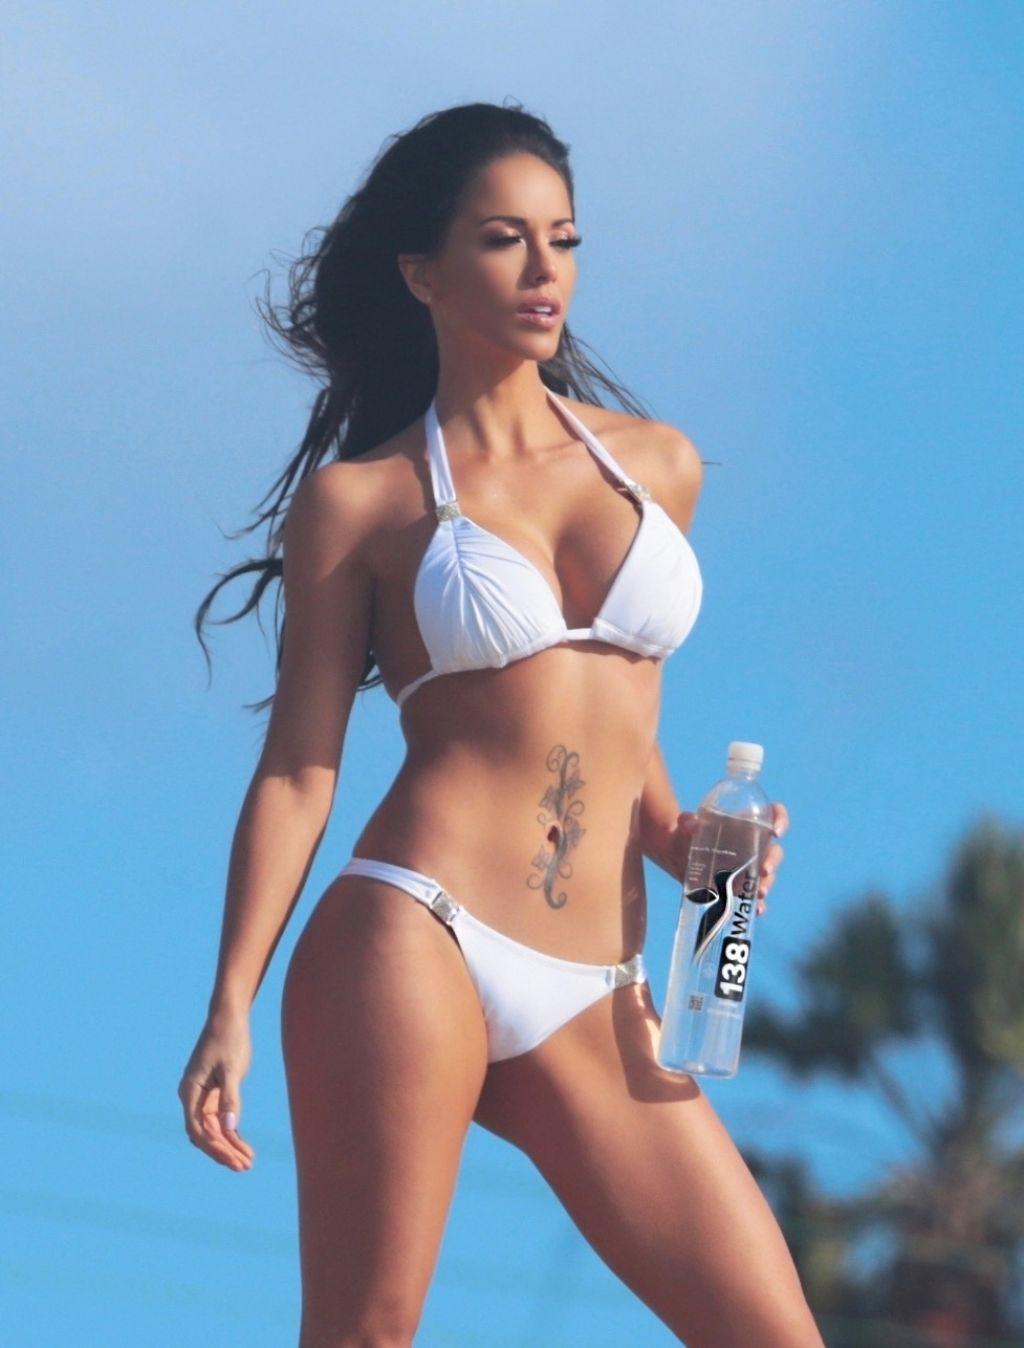 Melissa riso flaunts her bikini body